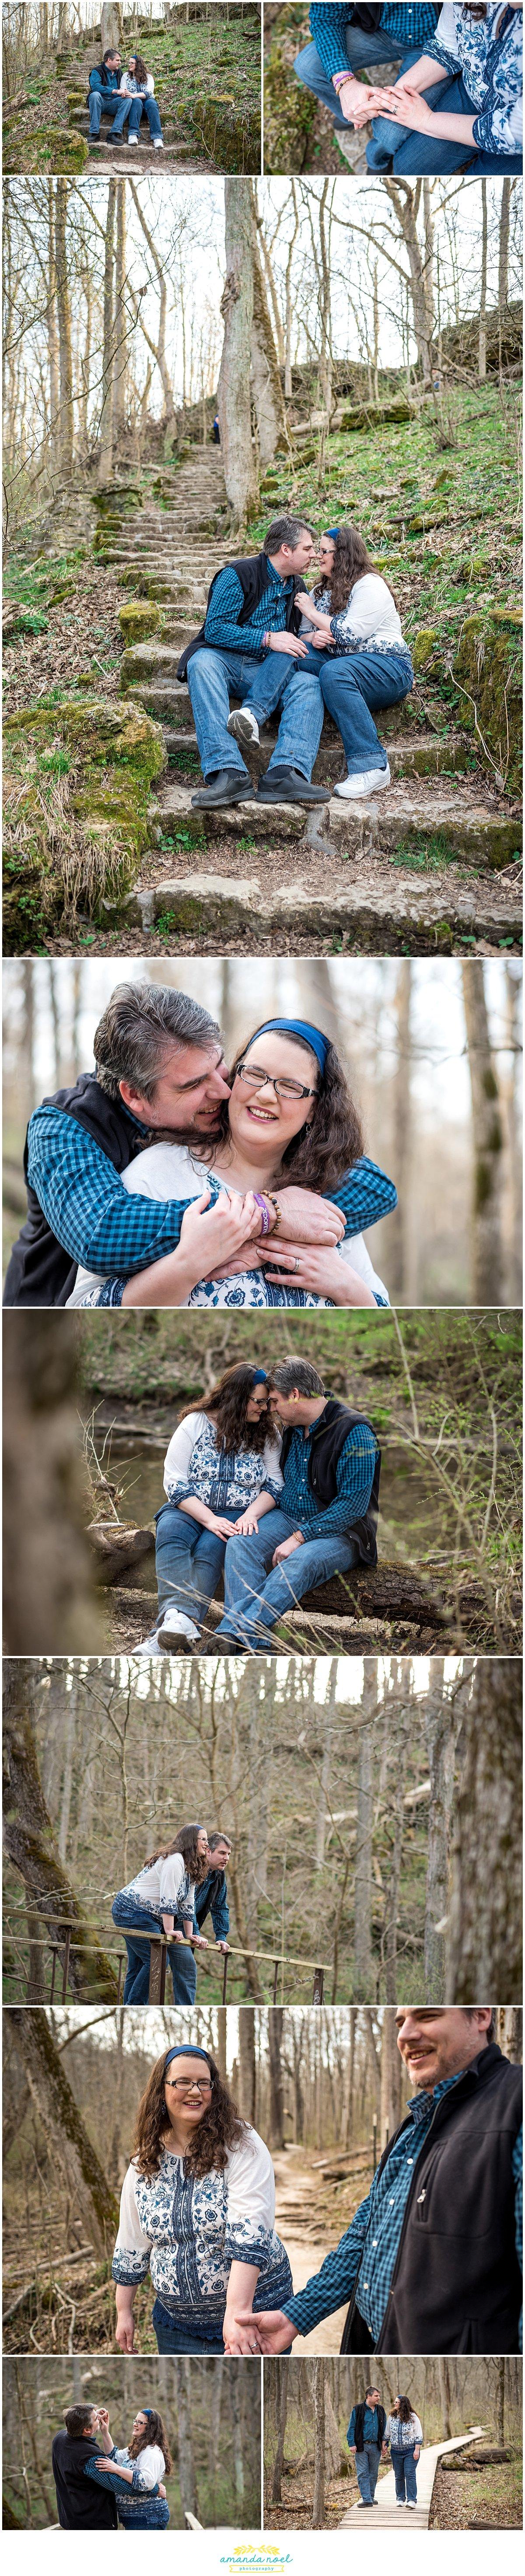 Dayton Wedding photographer | spring engagement in Glen Helen | Amanda Noel Photography